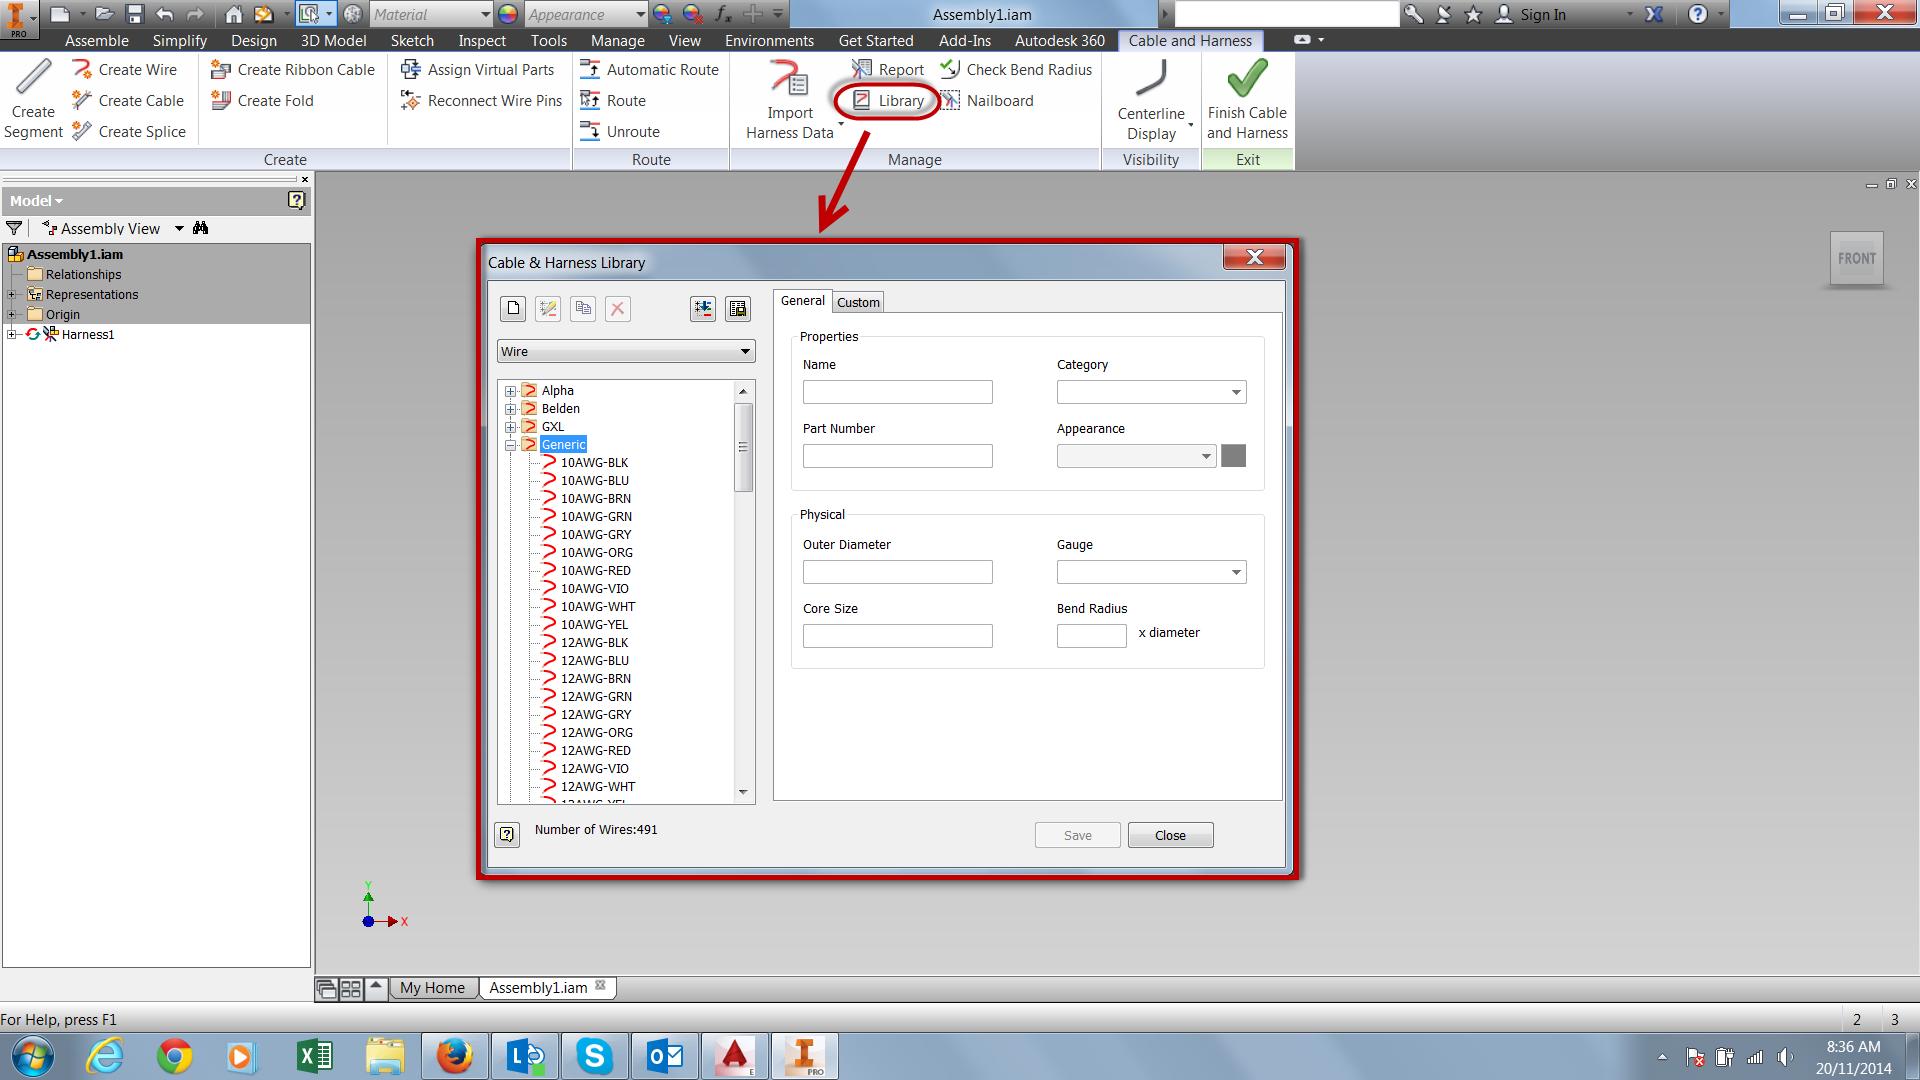 142373i97E4A82DA34E923A?v=1.0 autocad electrical library import autodesk community  at readyjetset.co